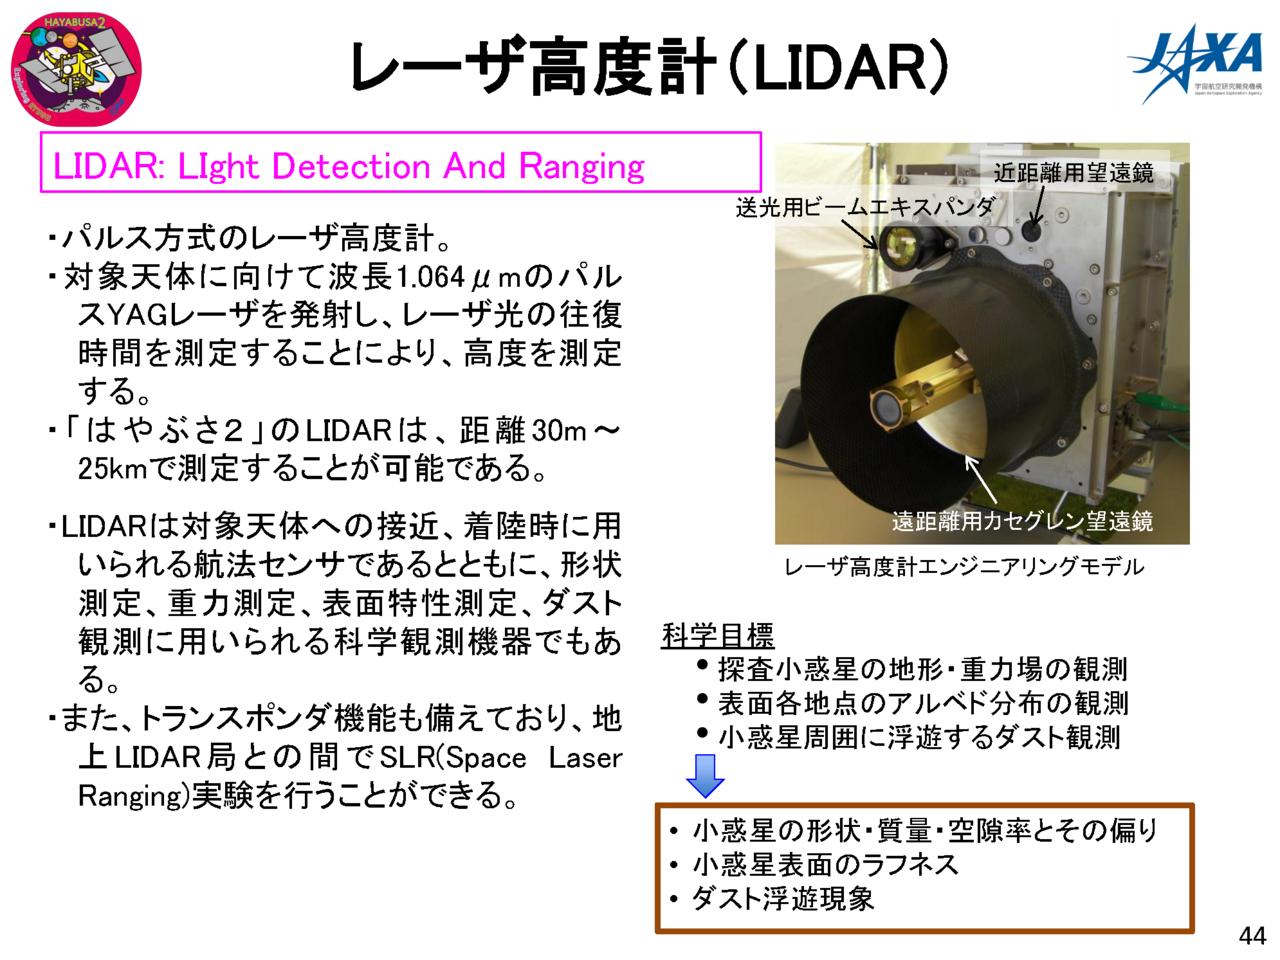 f:id:Imamura:20180719131739p:plain